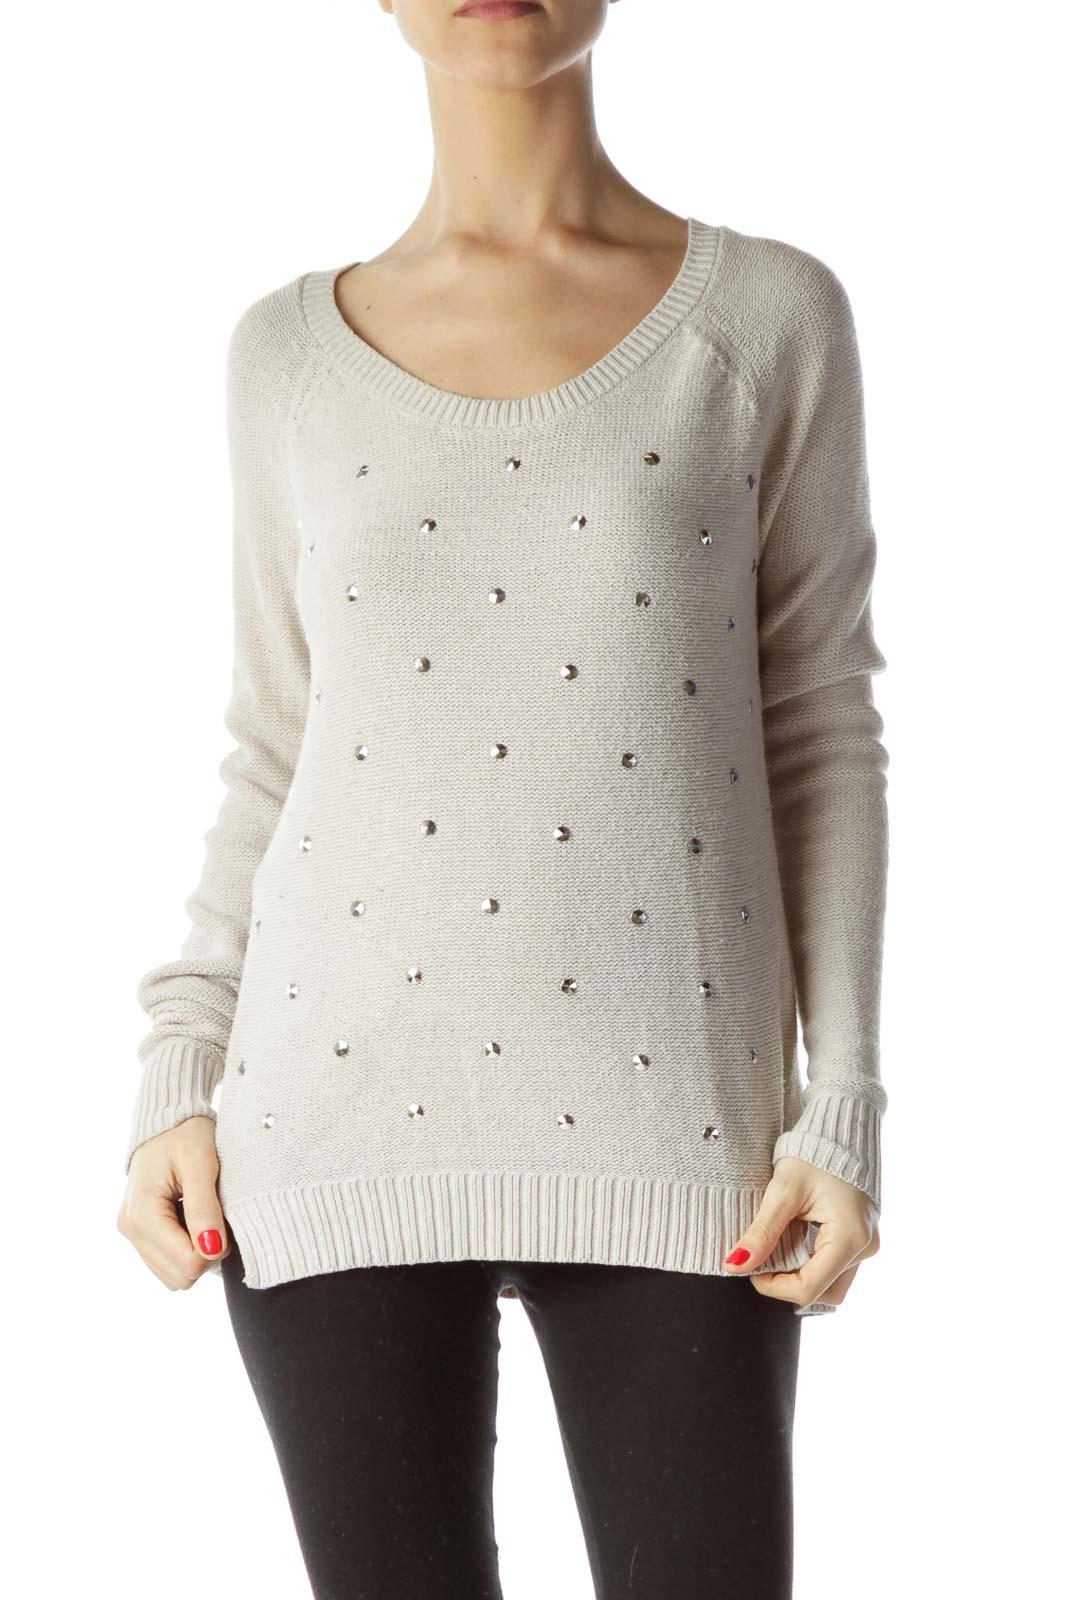 Beige Silver Studs Round Neck Knit Sweater Front